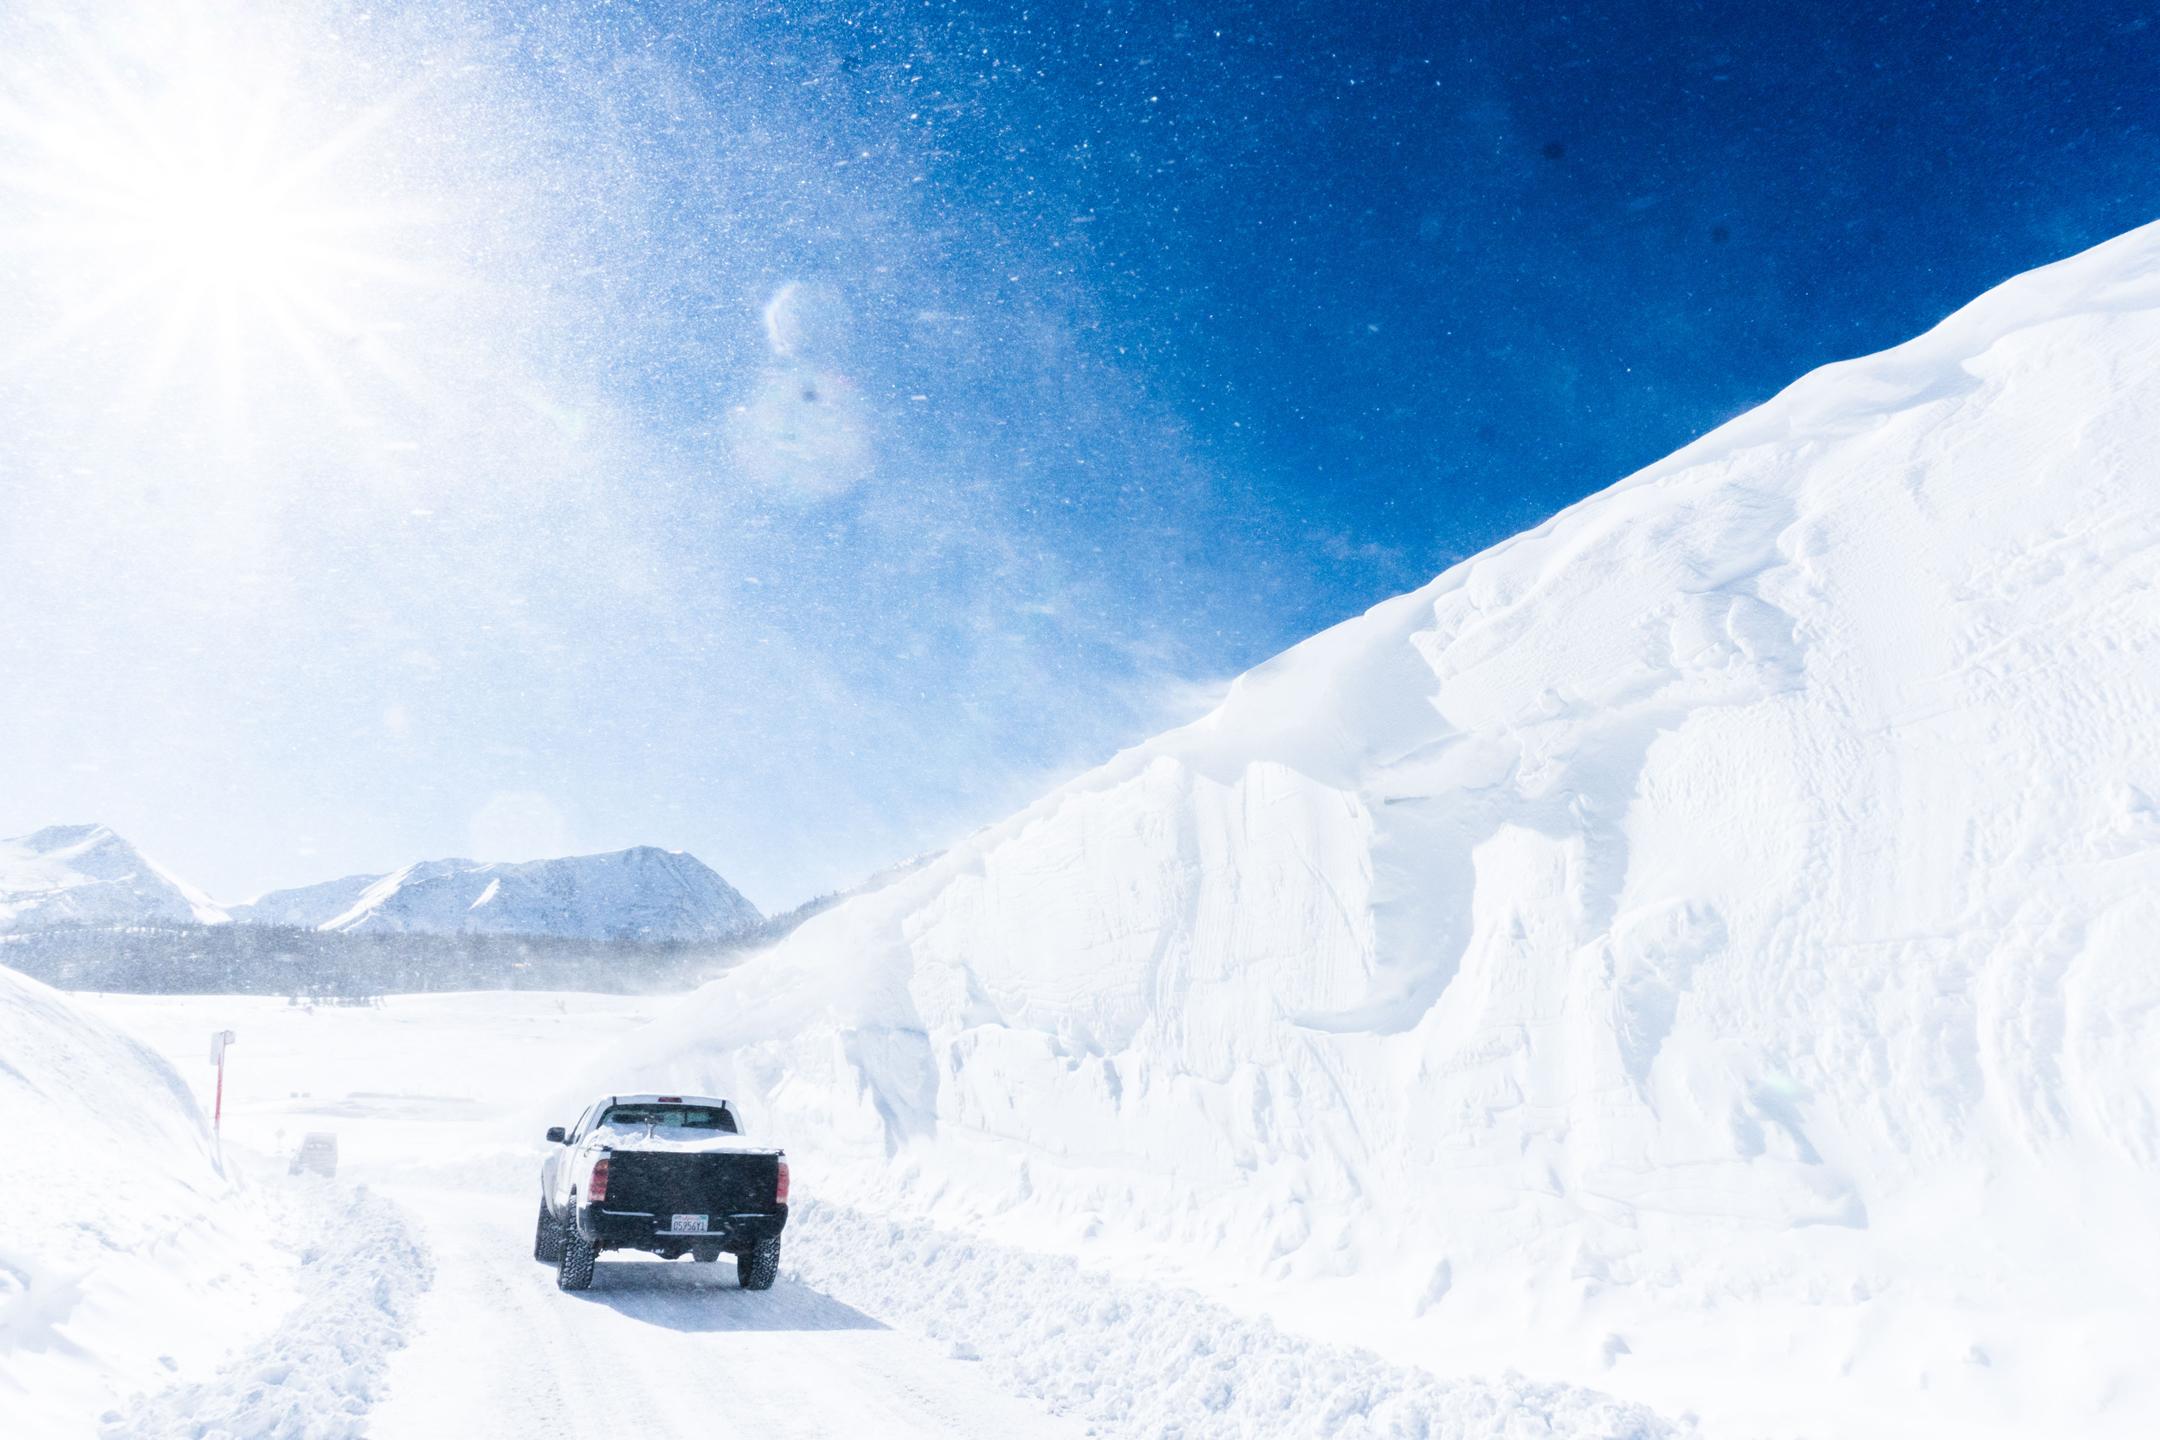 2017-02-23-Winter-New-Snow-Mammoth-Lakes-WRAY-03066.jpg